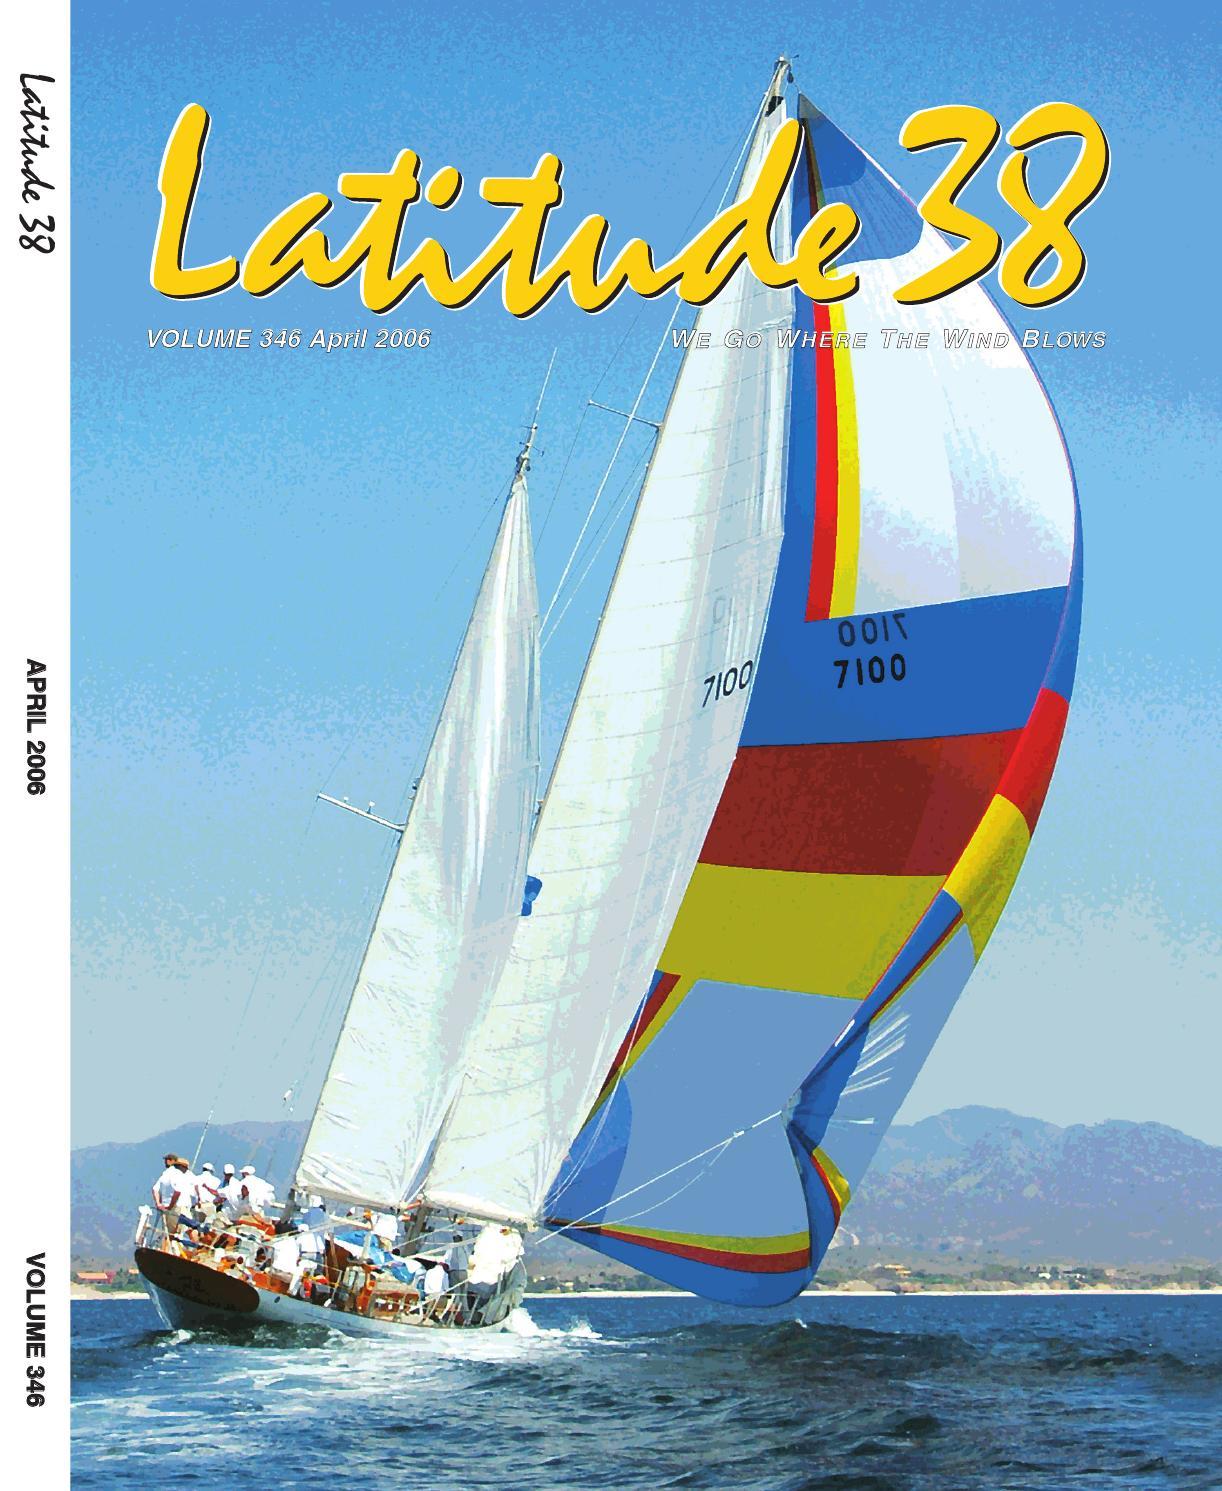 Latitude 38 April 2006 by Latitude 38 Media ce3fcb2f4624a